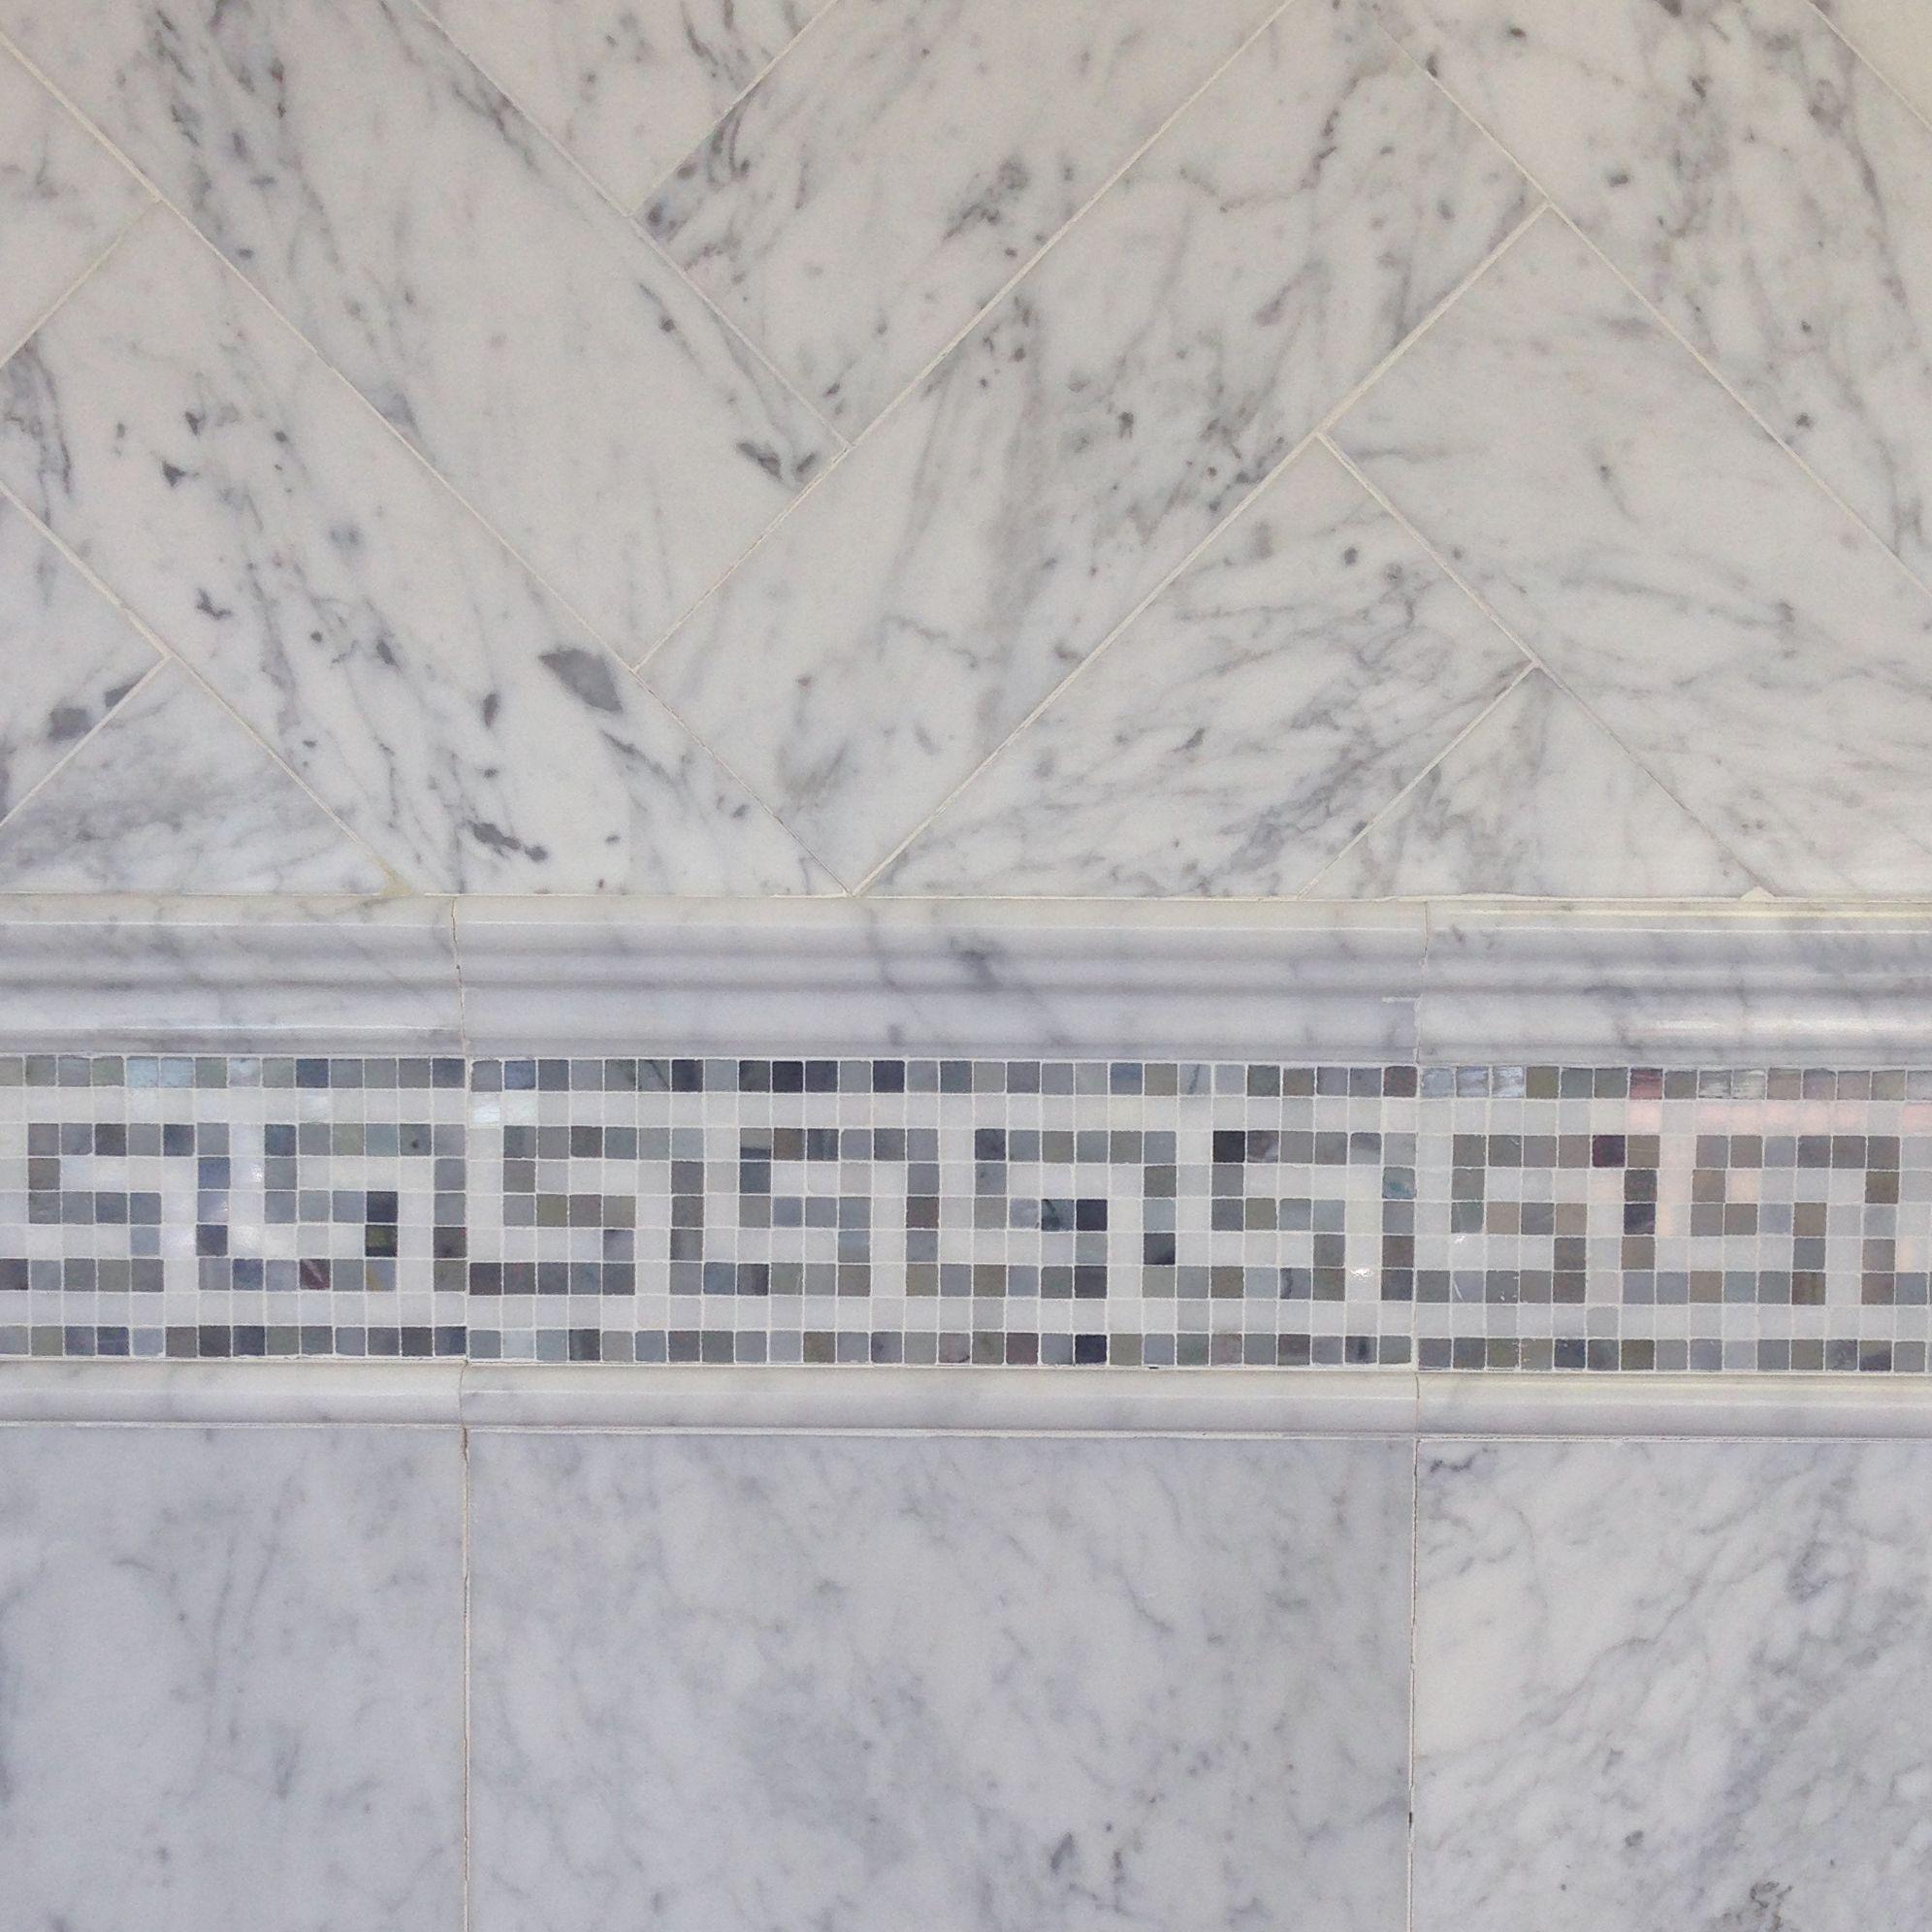 6 215 12 Bianco Carrara Marble Tile With Greek Key Border And